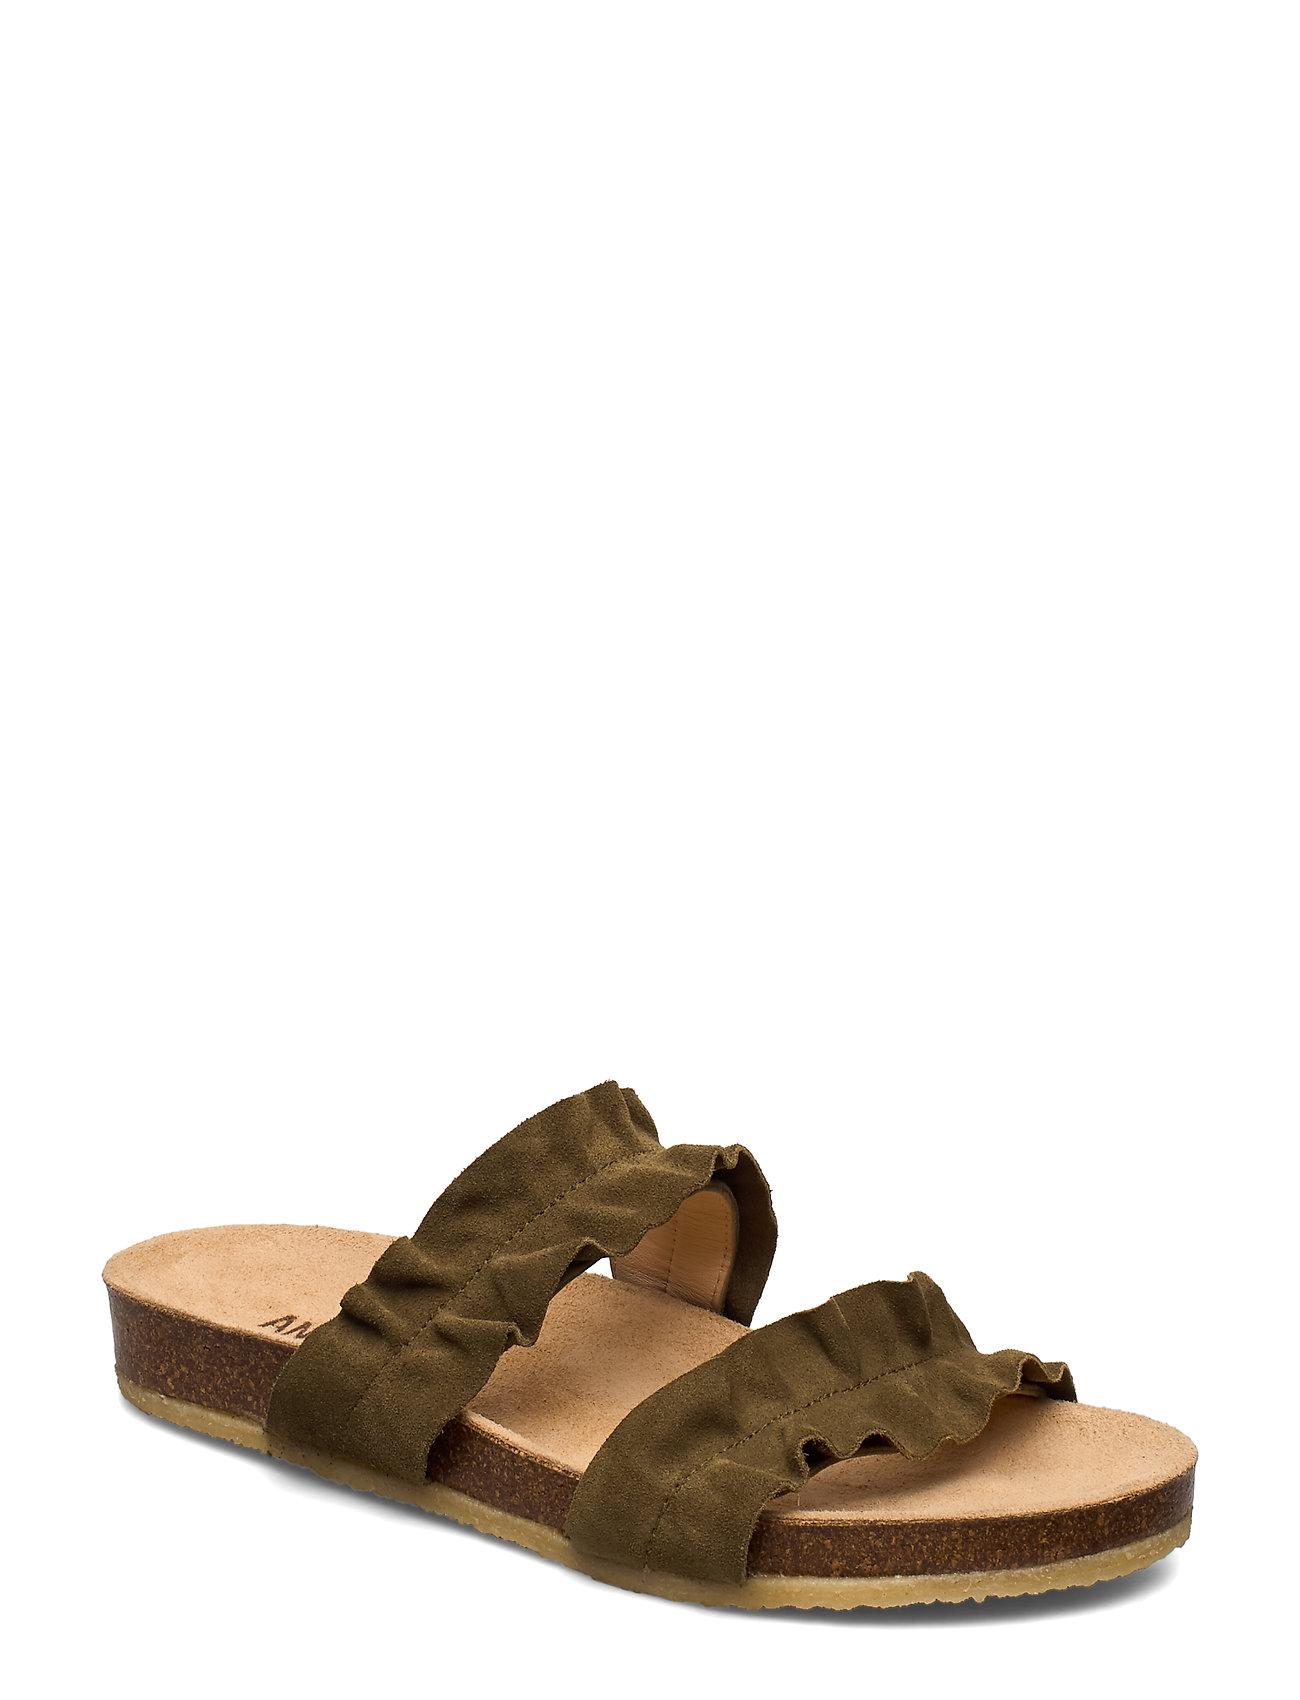 Image of Sandals - Flat - Open Toe - Op Shoes Summer Shoes Flat Sandals Grøn ANGULUS (3334142579)